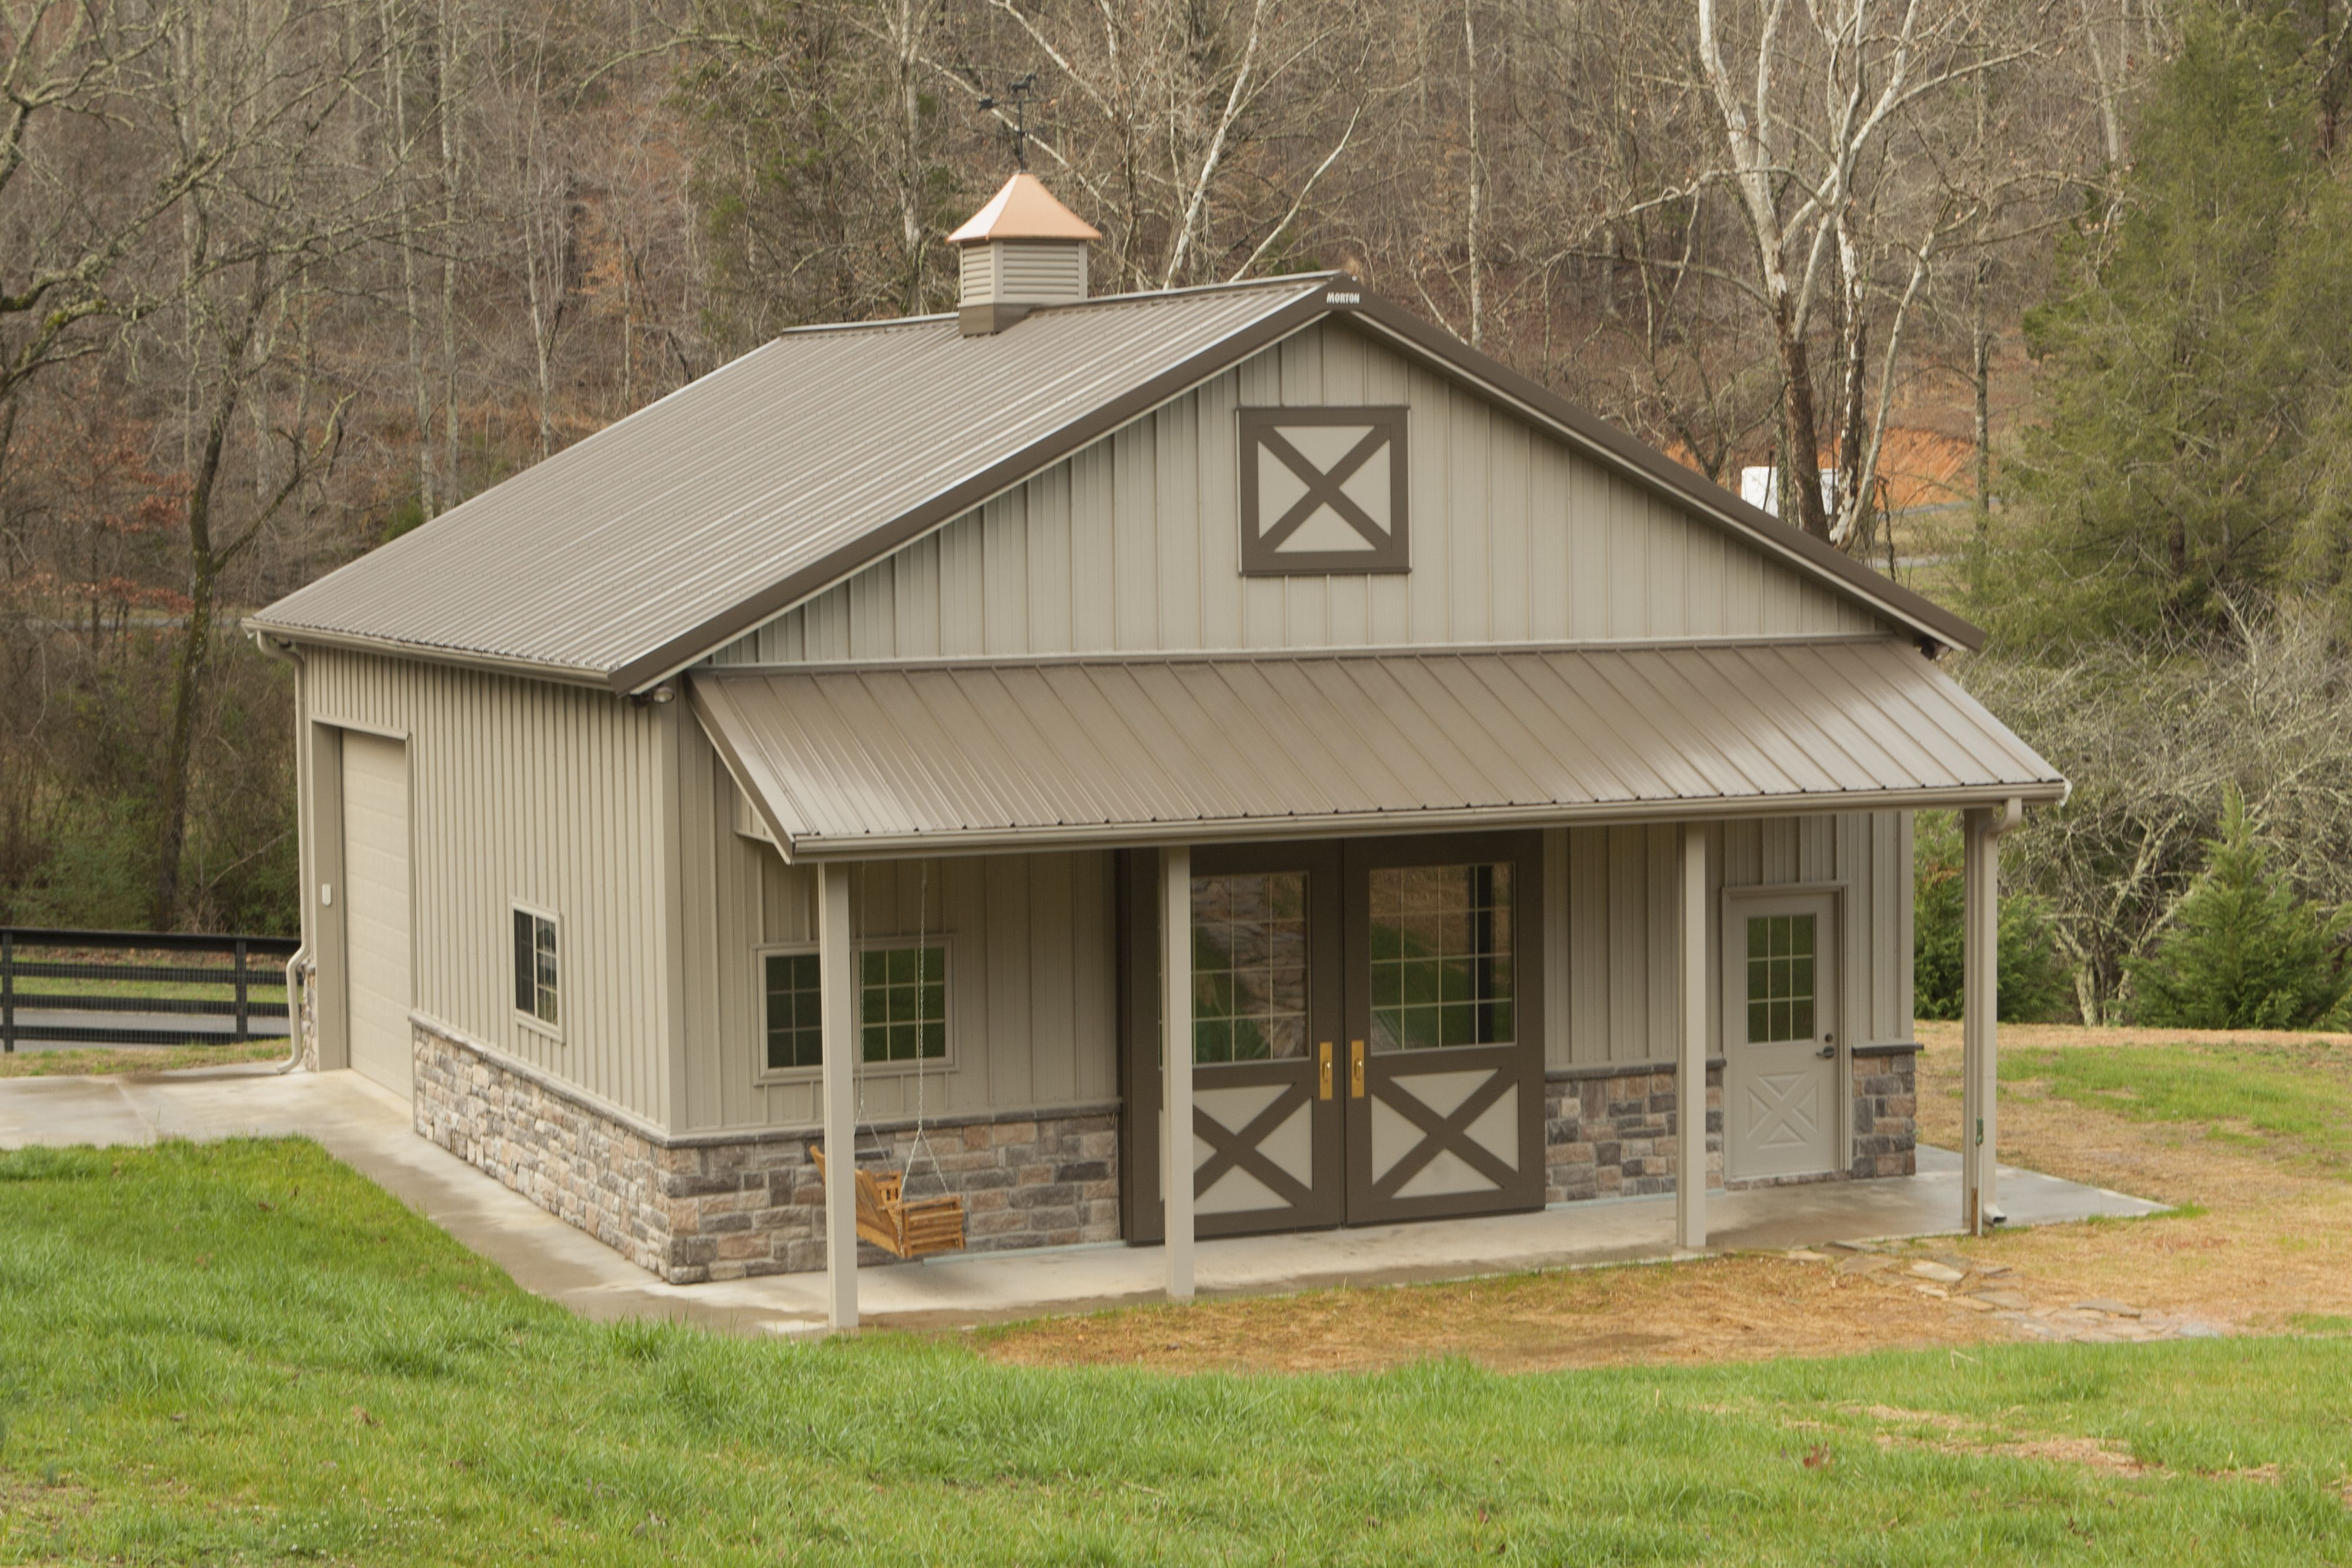 Best Kitchen Gallery: Morton Buildings Garage In Knoxville Tennessee Barns Pinterest of Morton Building Home Metal Designs on rachelxblog.com